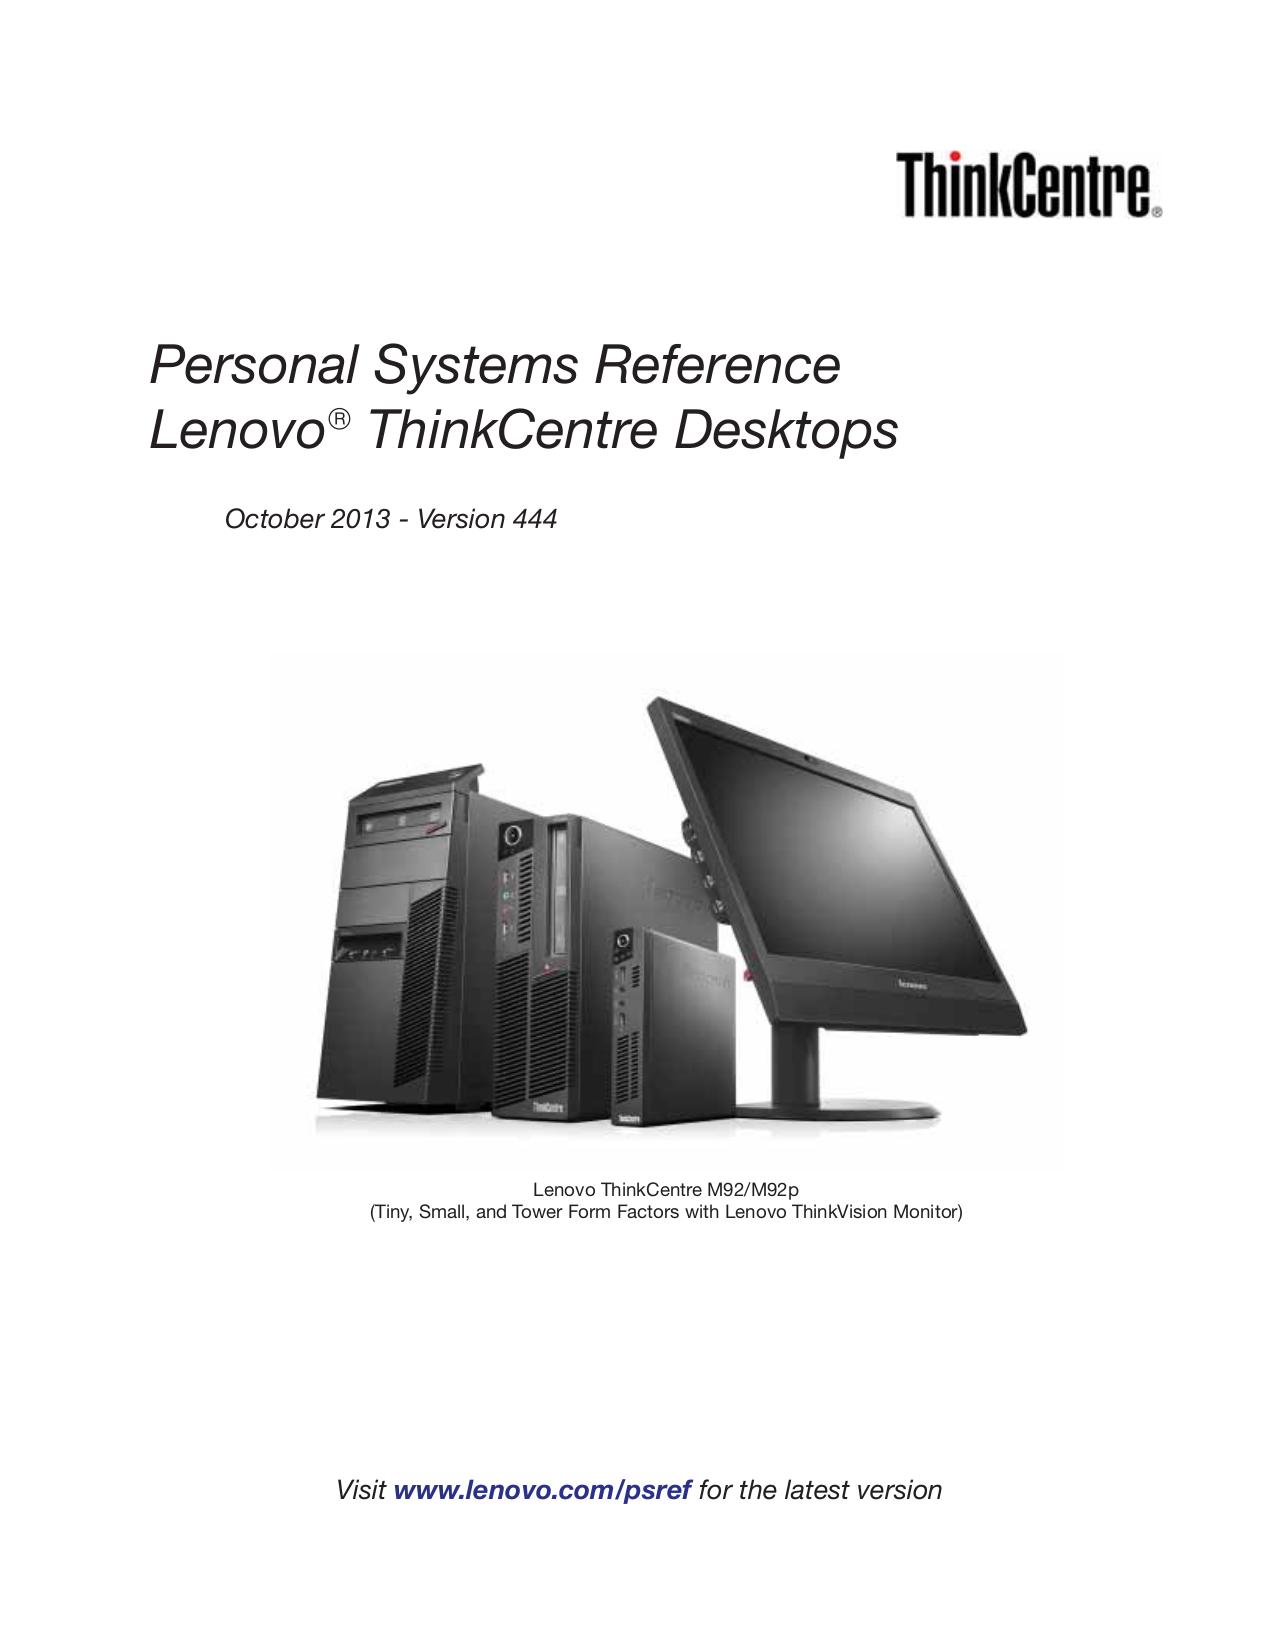 pdf for Lenovo Desktop ThinkCentre M91 7516 manual